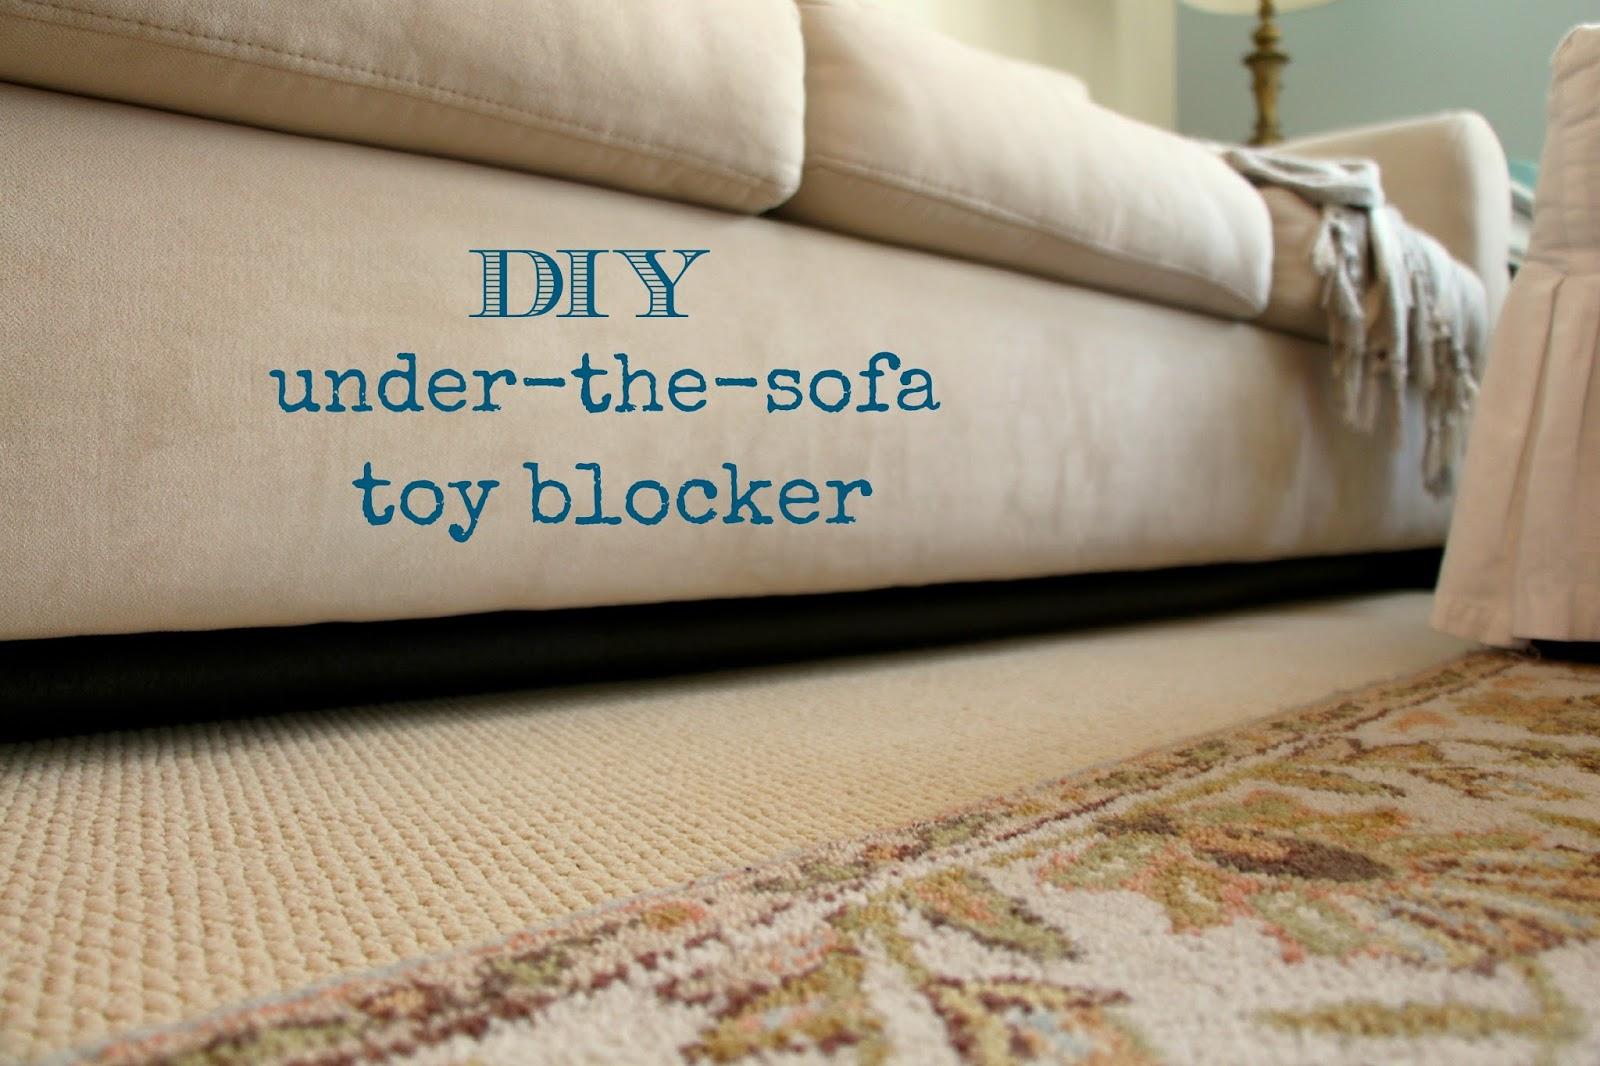 Diy Under The Sofa Toy Blocker